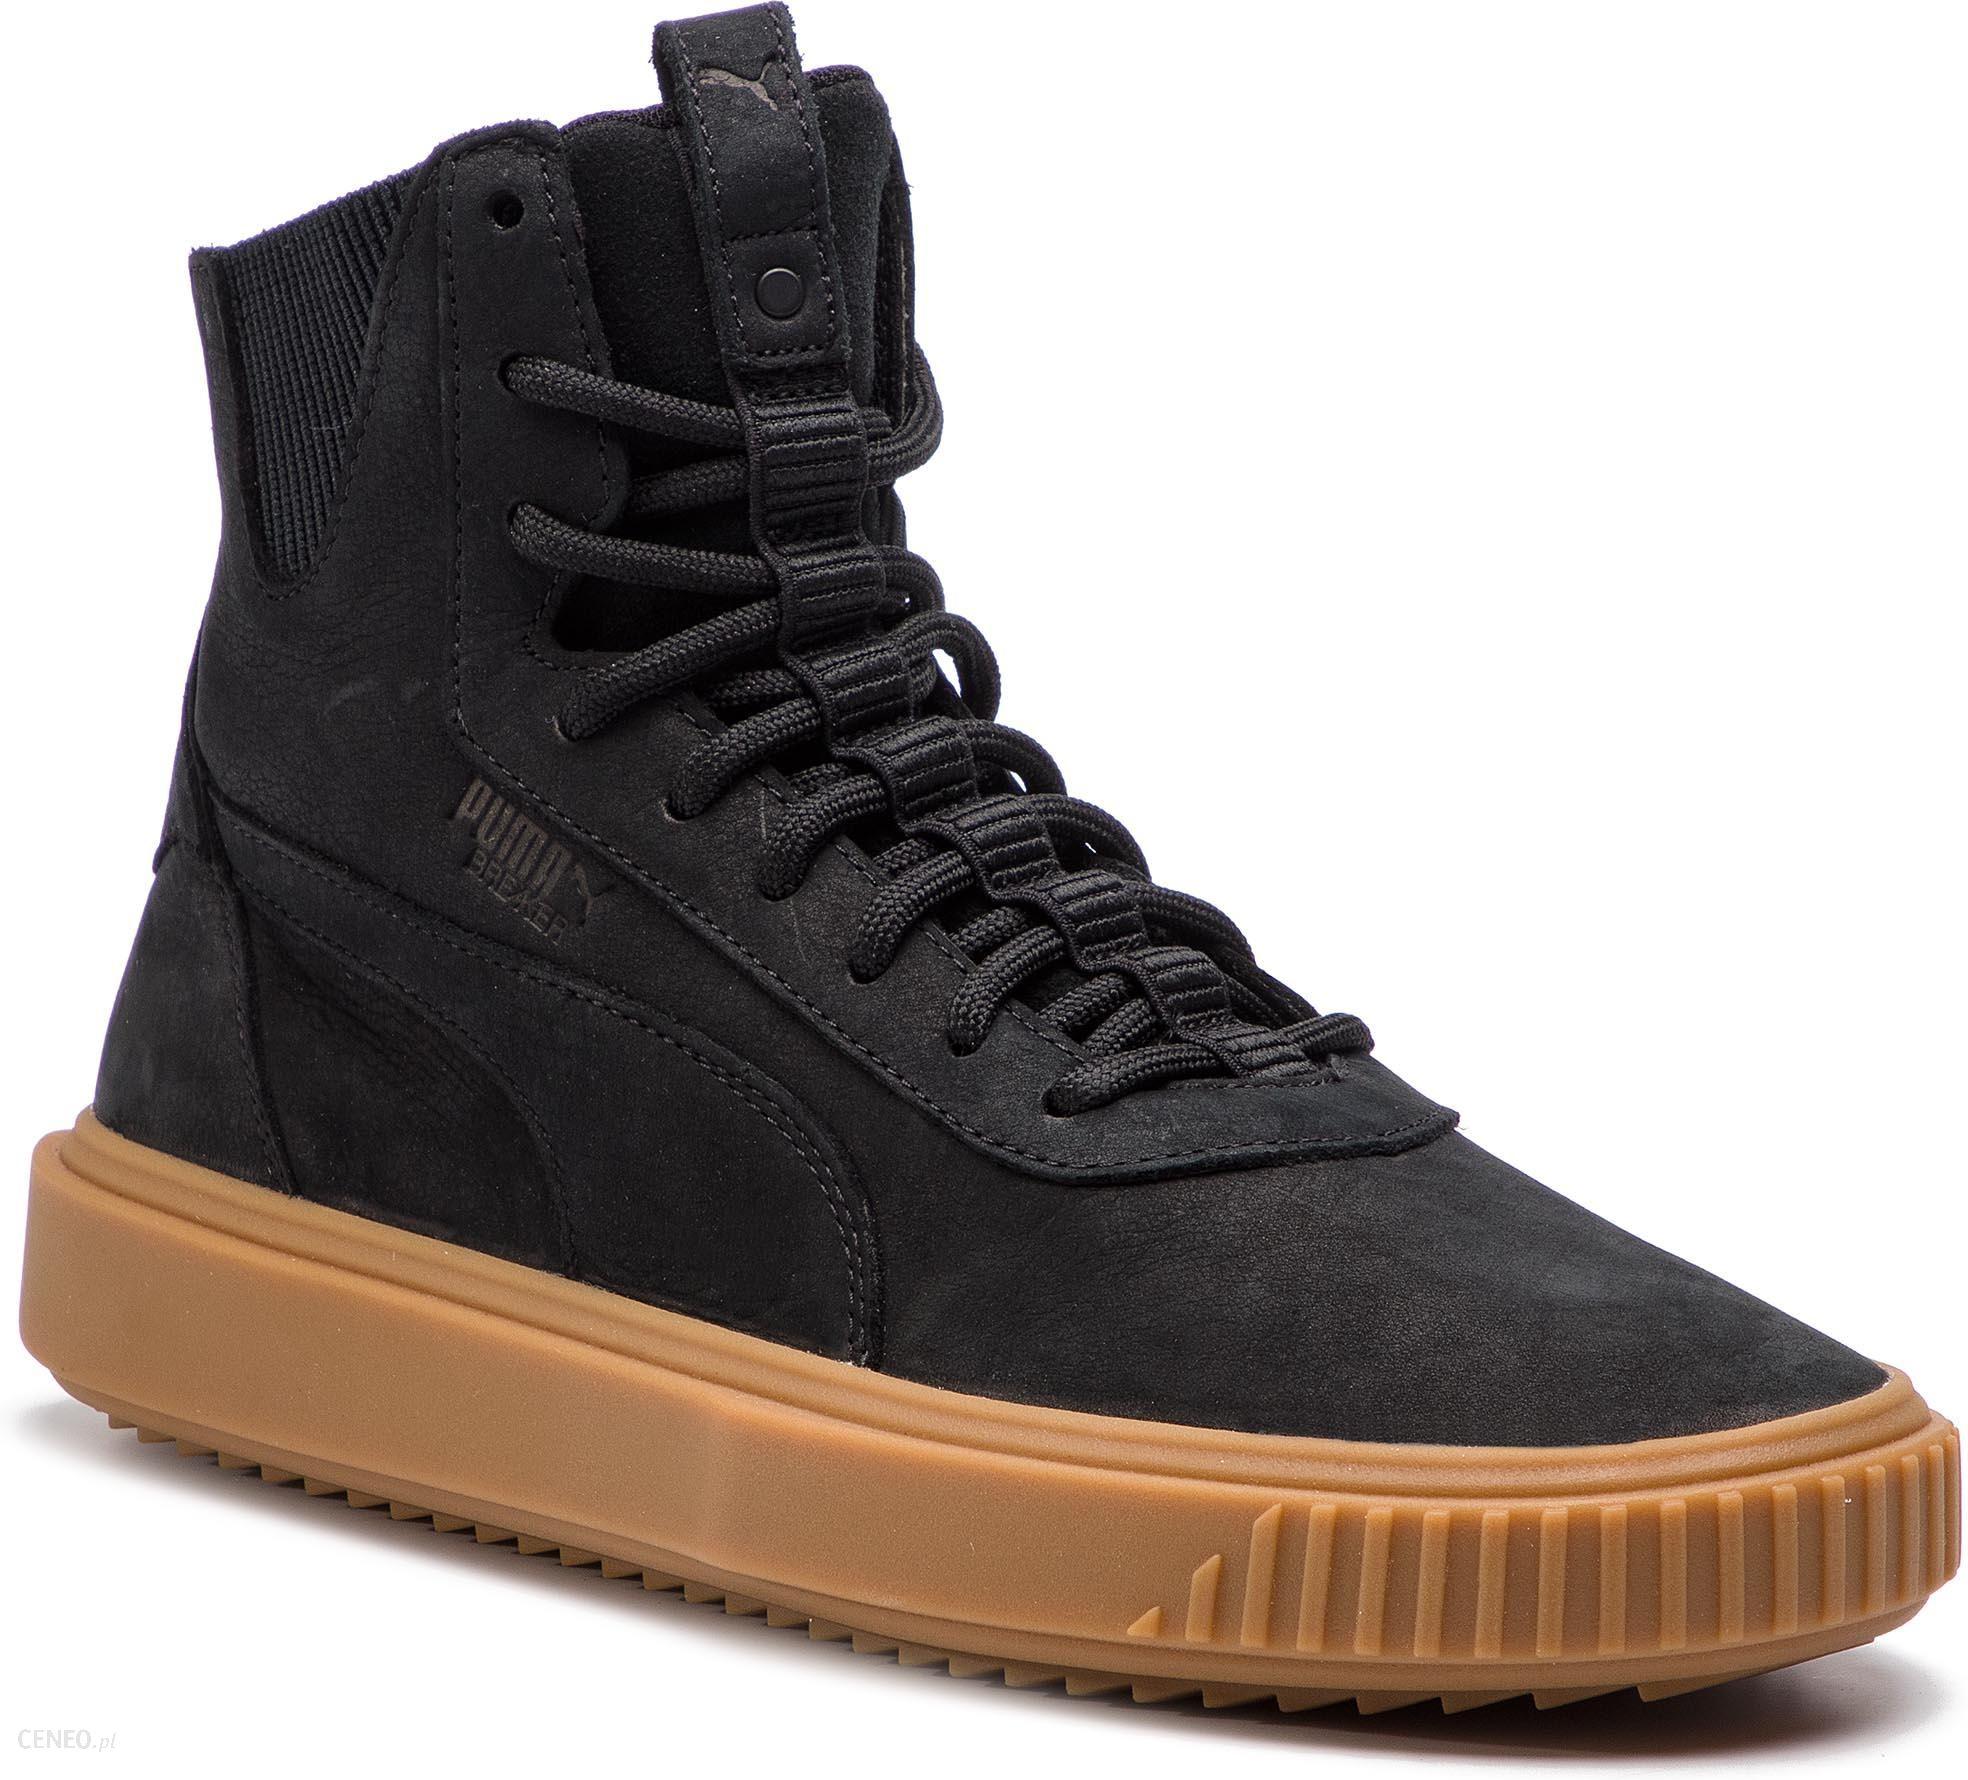 Sneakersy PUMA Breaker Hi Gum 367715 01 Puma BlackPuma Black Ceny i opinie Ceneo.pl